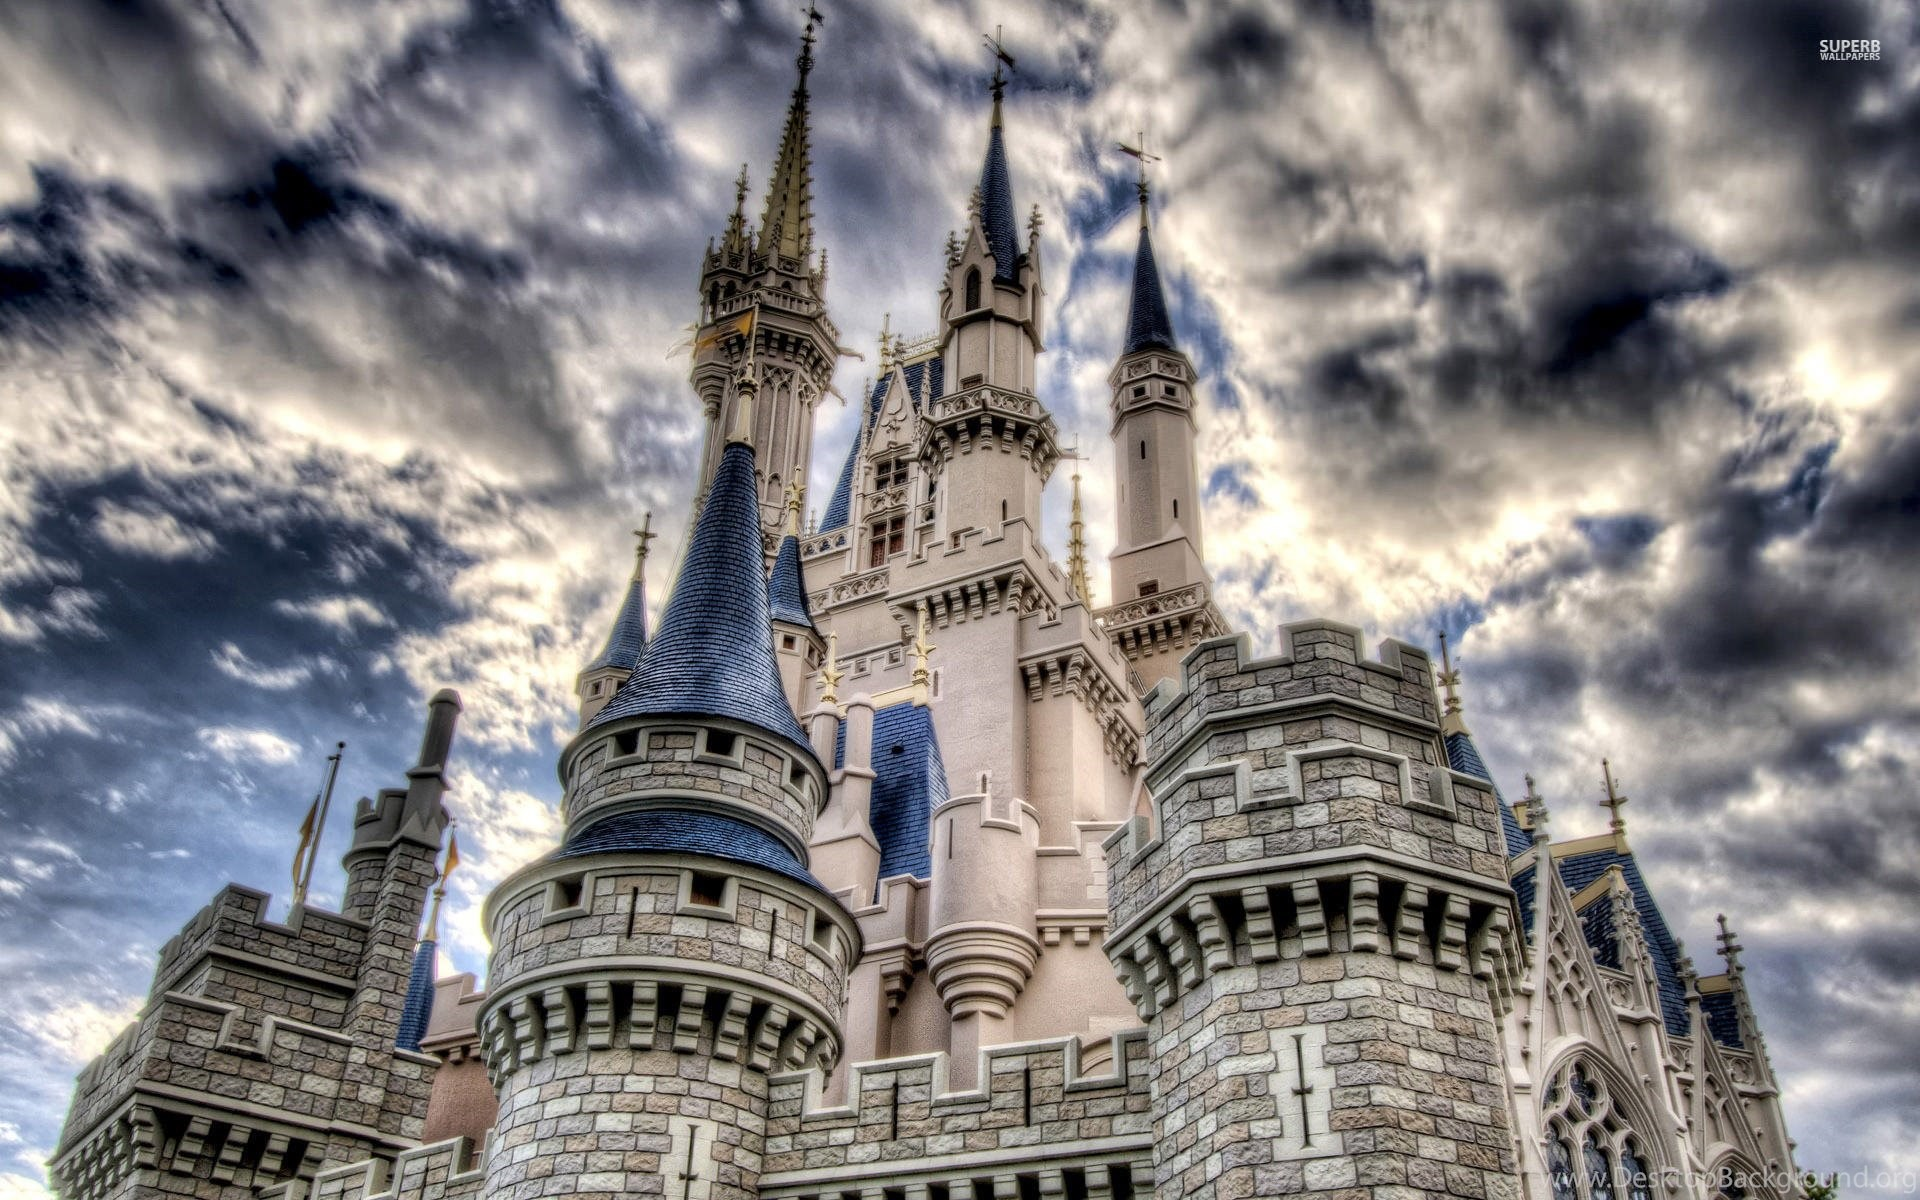 Disney Desktop Wallpaper Hd: Disney World Wallpapers For Disney World HD Wallpapers Inx